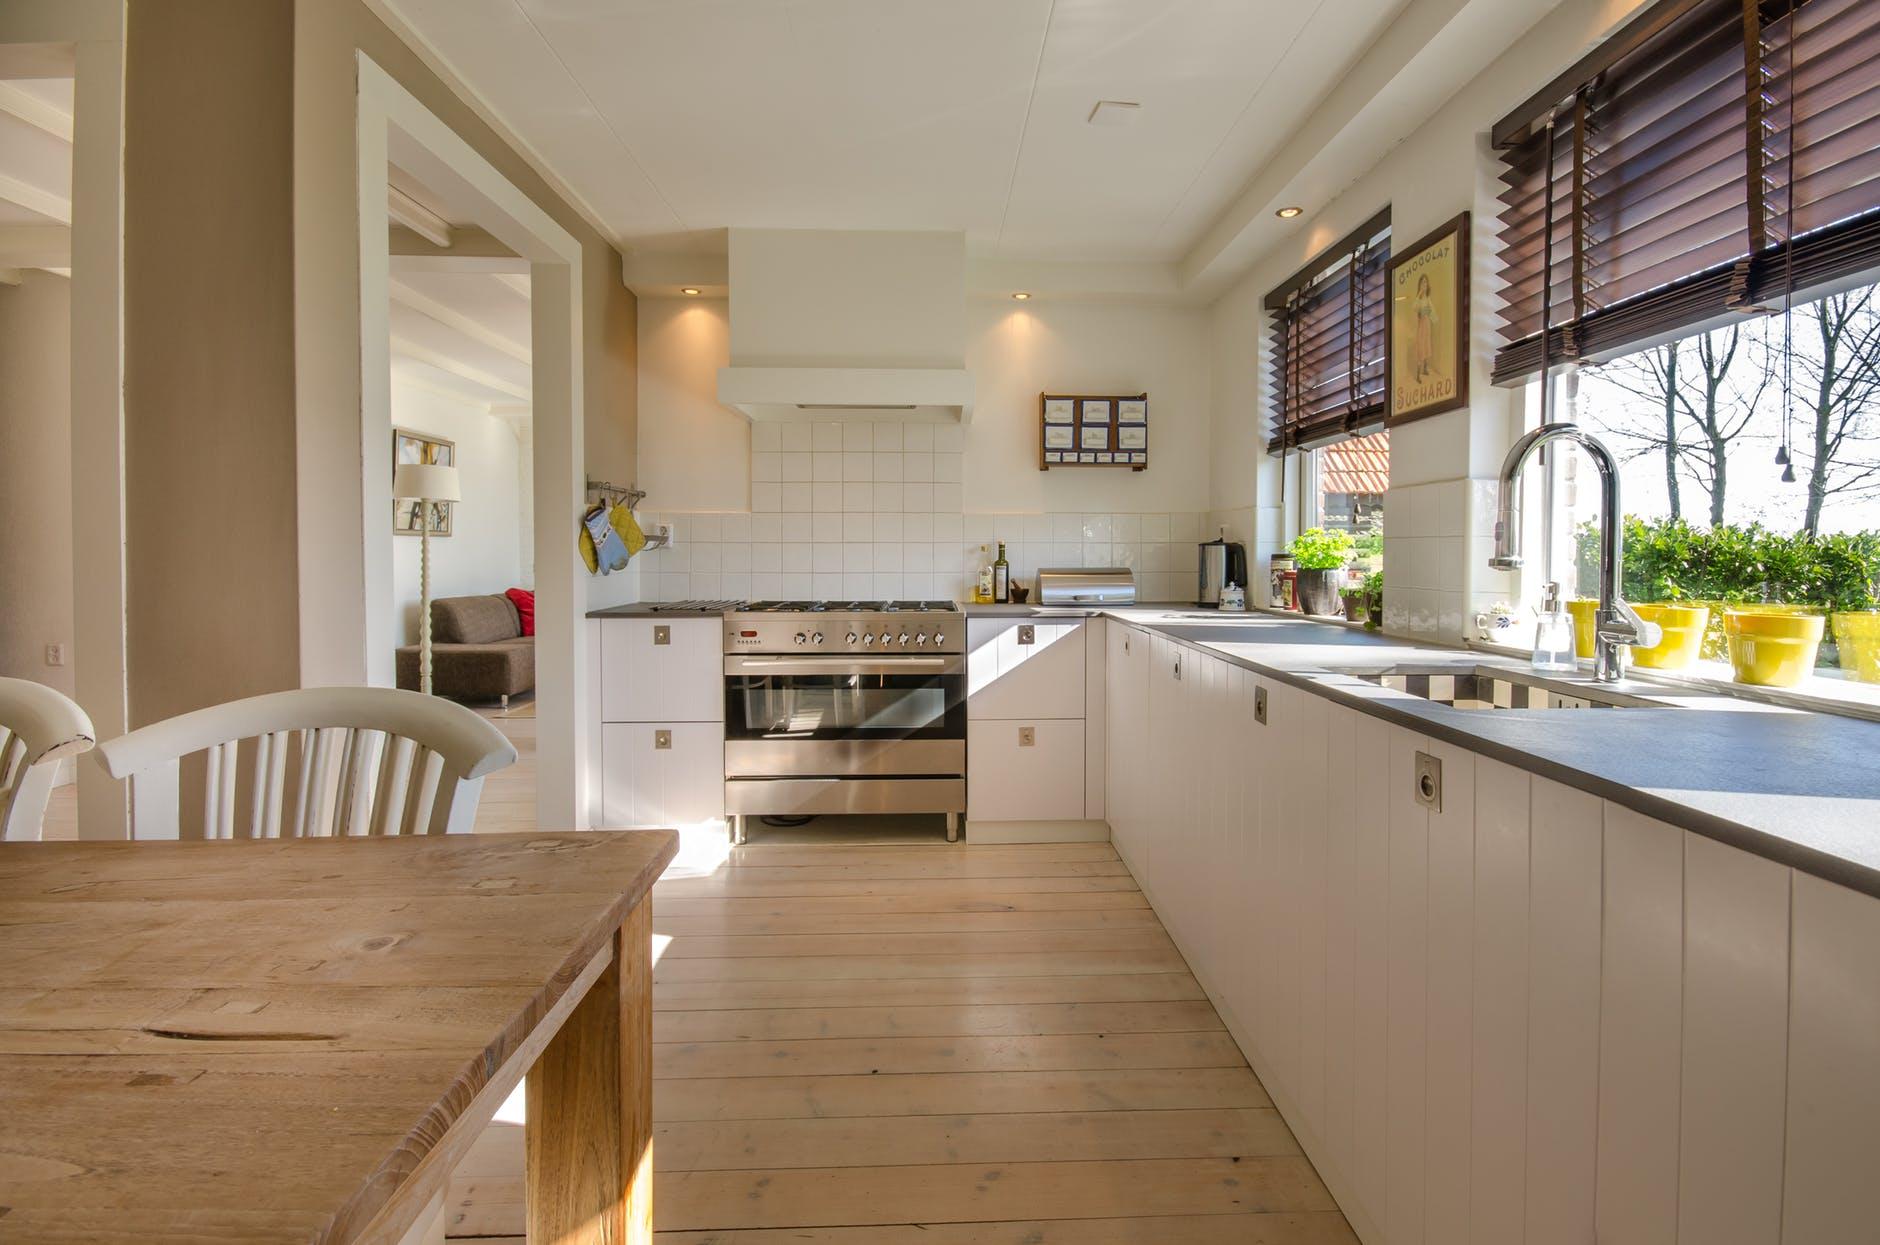 7 kitchen stove sink kitchen counter 349749